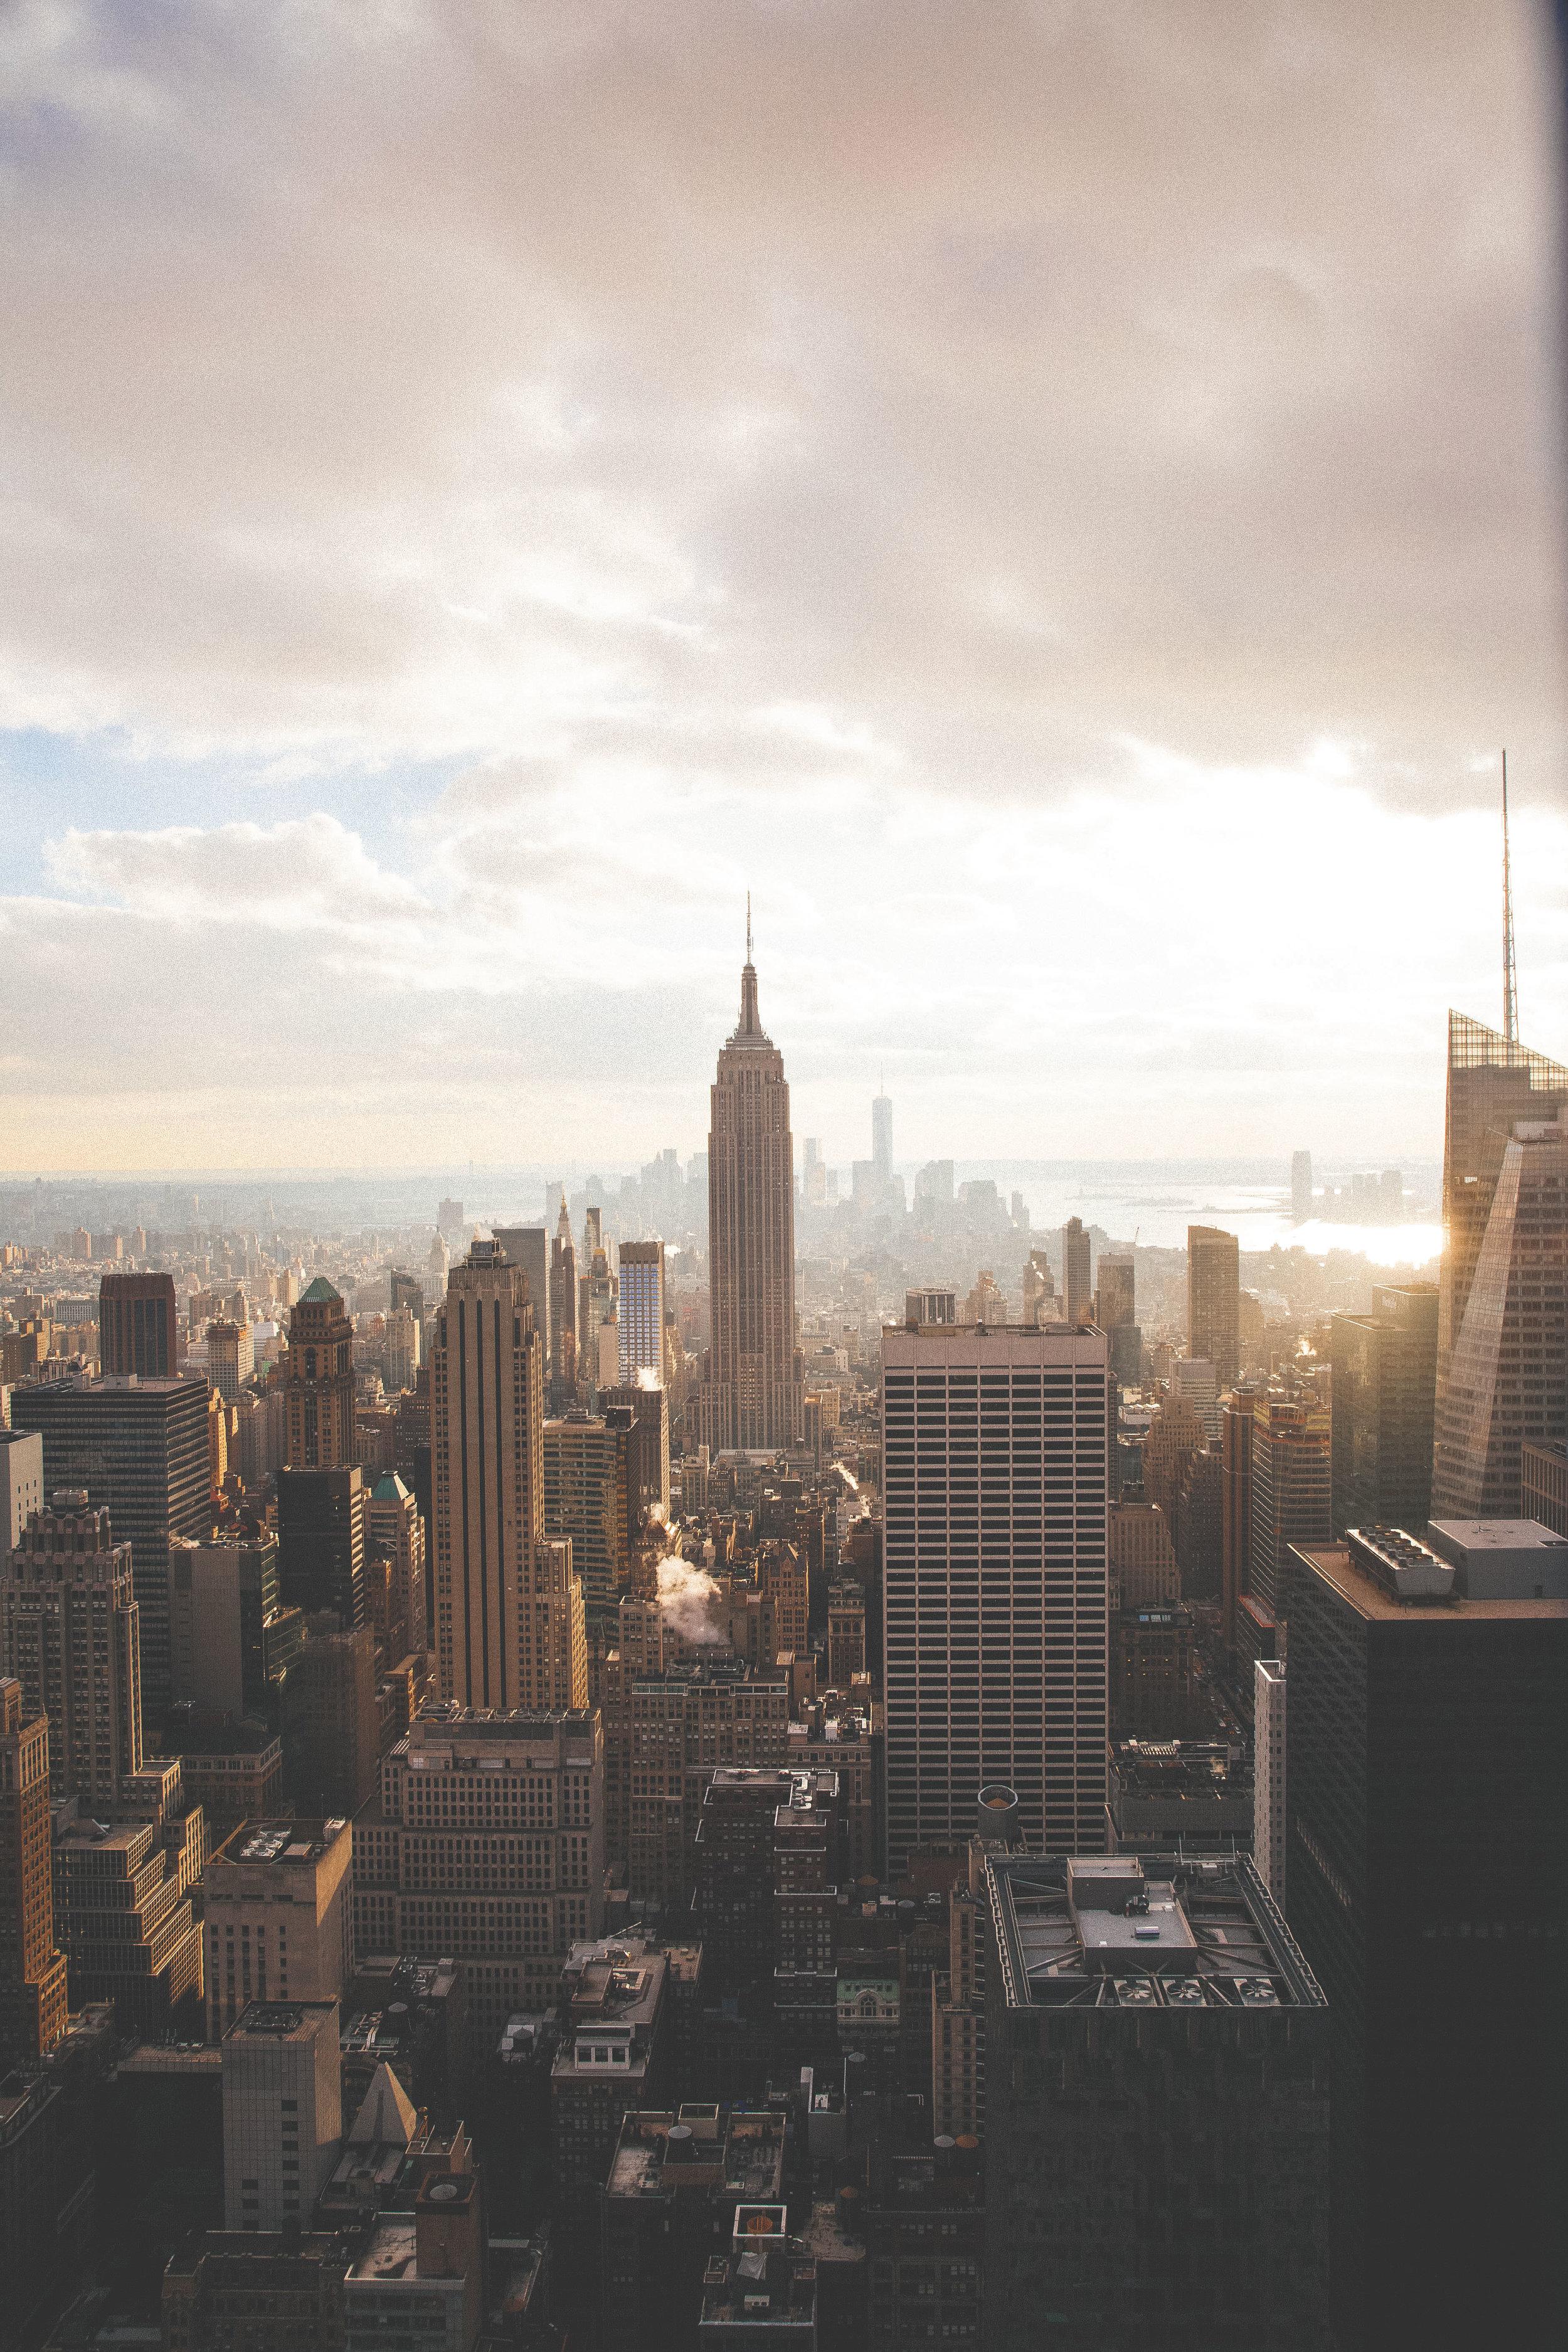 Travel Posts - Enter the Blog